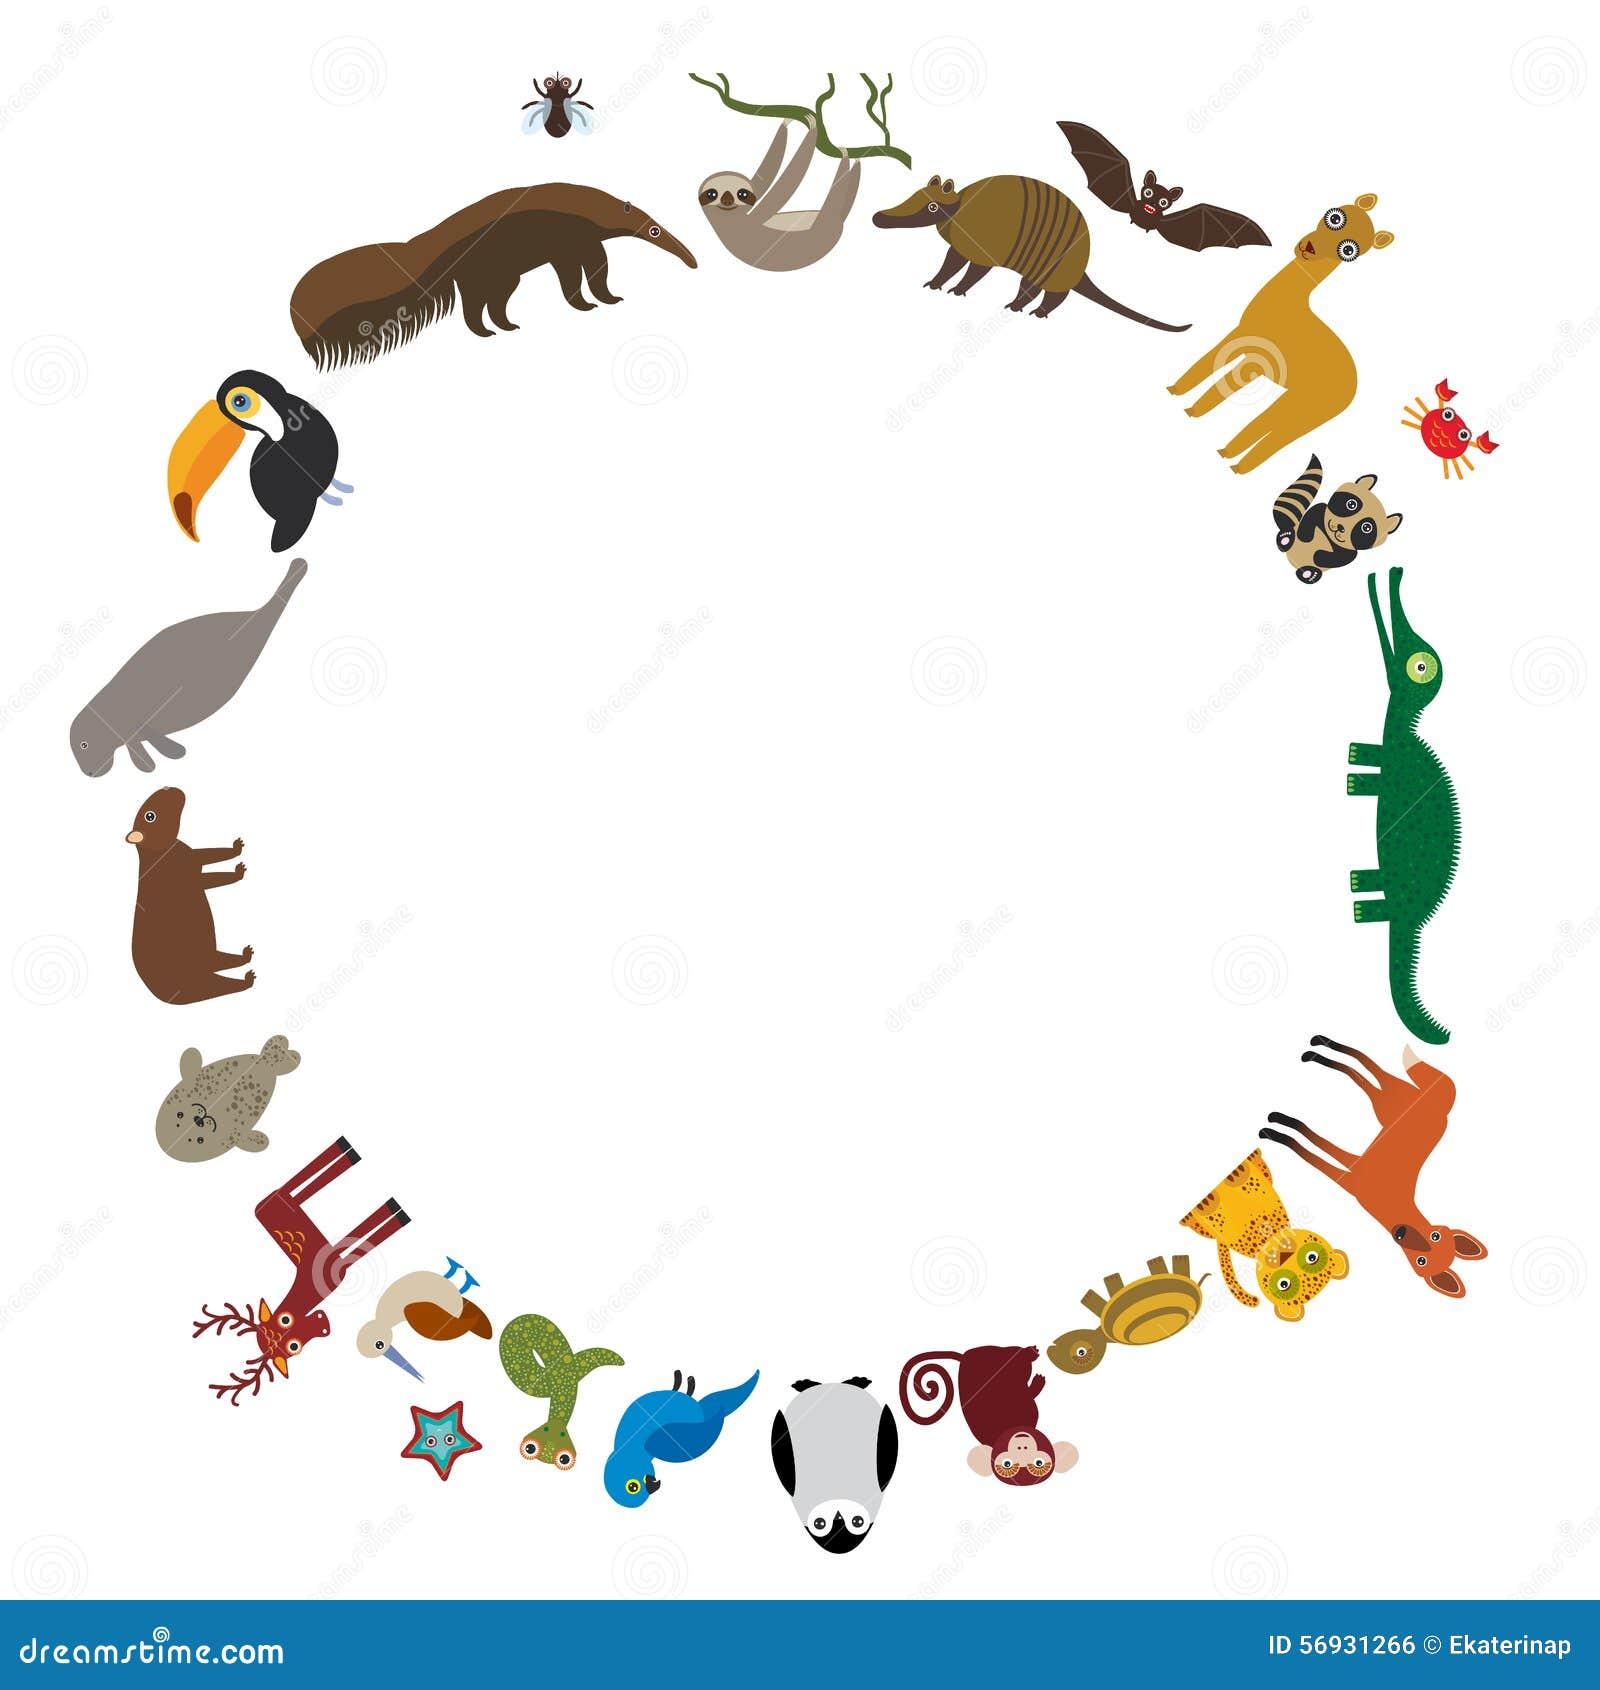 Round frame. Sloth anteater toucan lama bat seal armadillo boa manatee ...